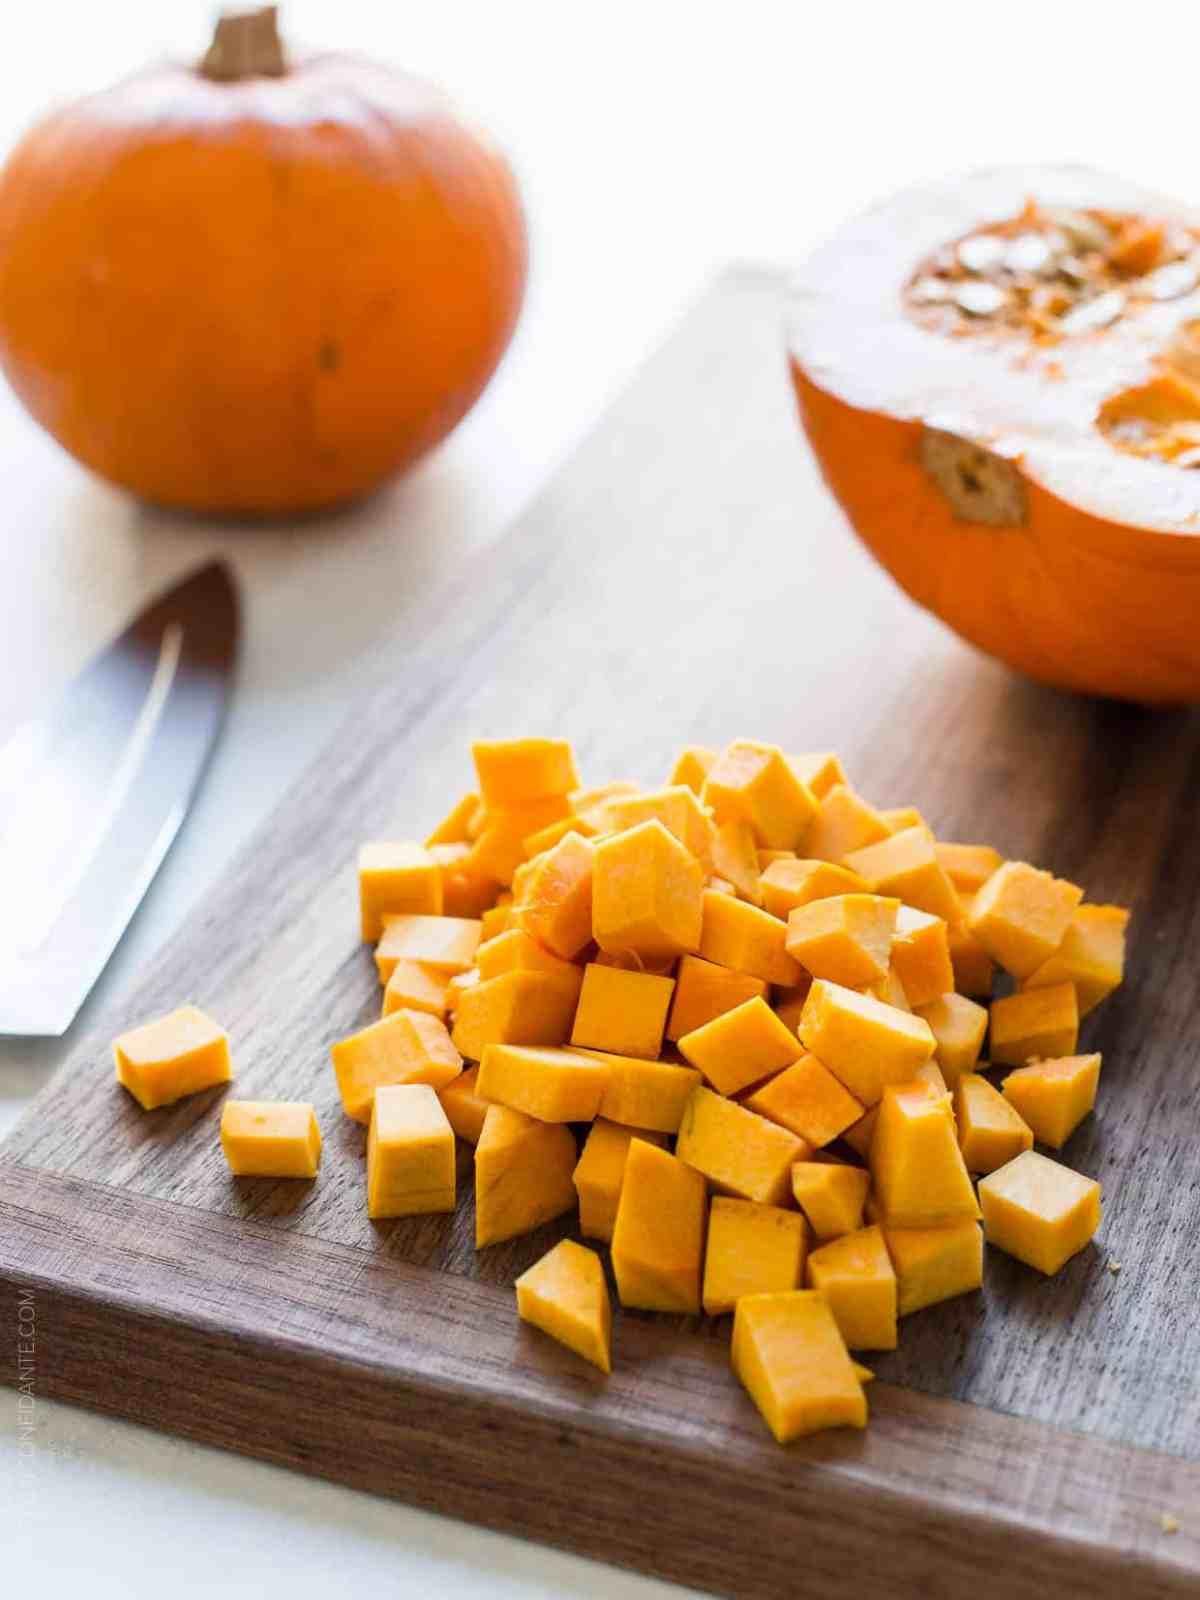 Diced pumpkin chunks on a wooden cutting board ready to be used in Turkey Pumpkin Pot Pie.